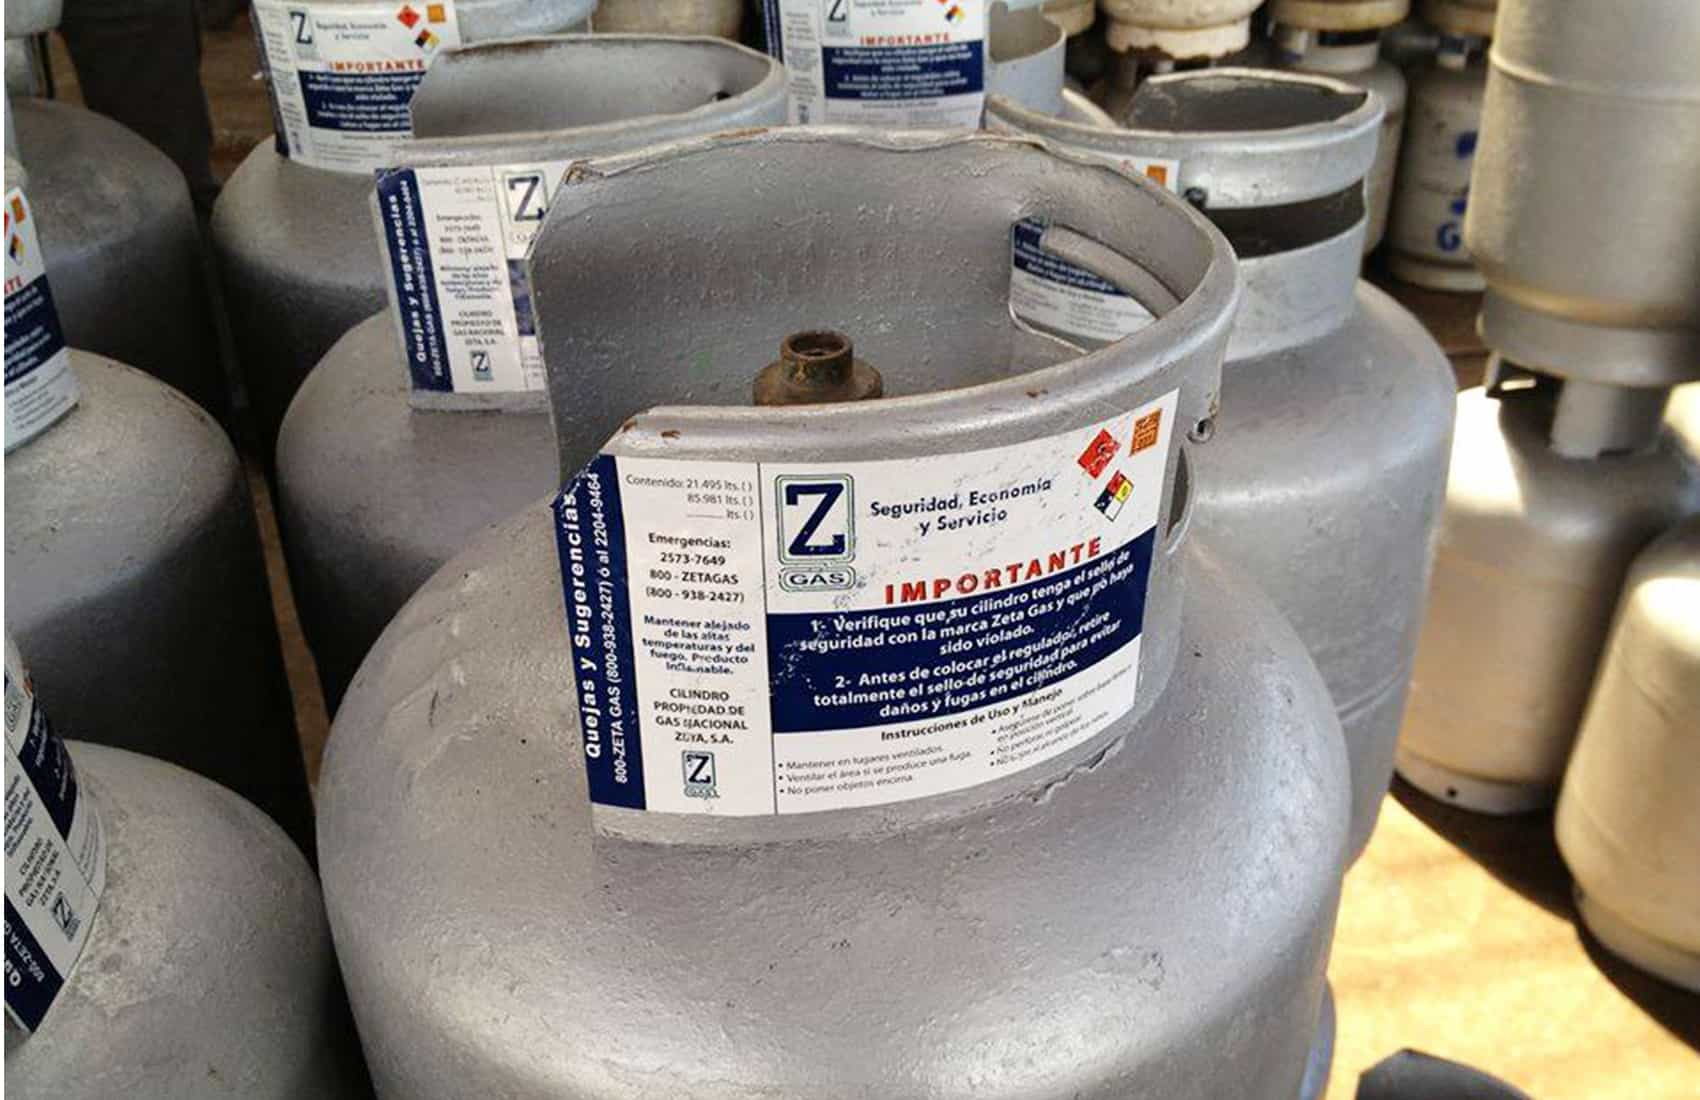 Propane gas cylinders.